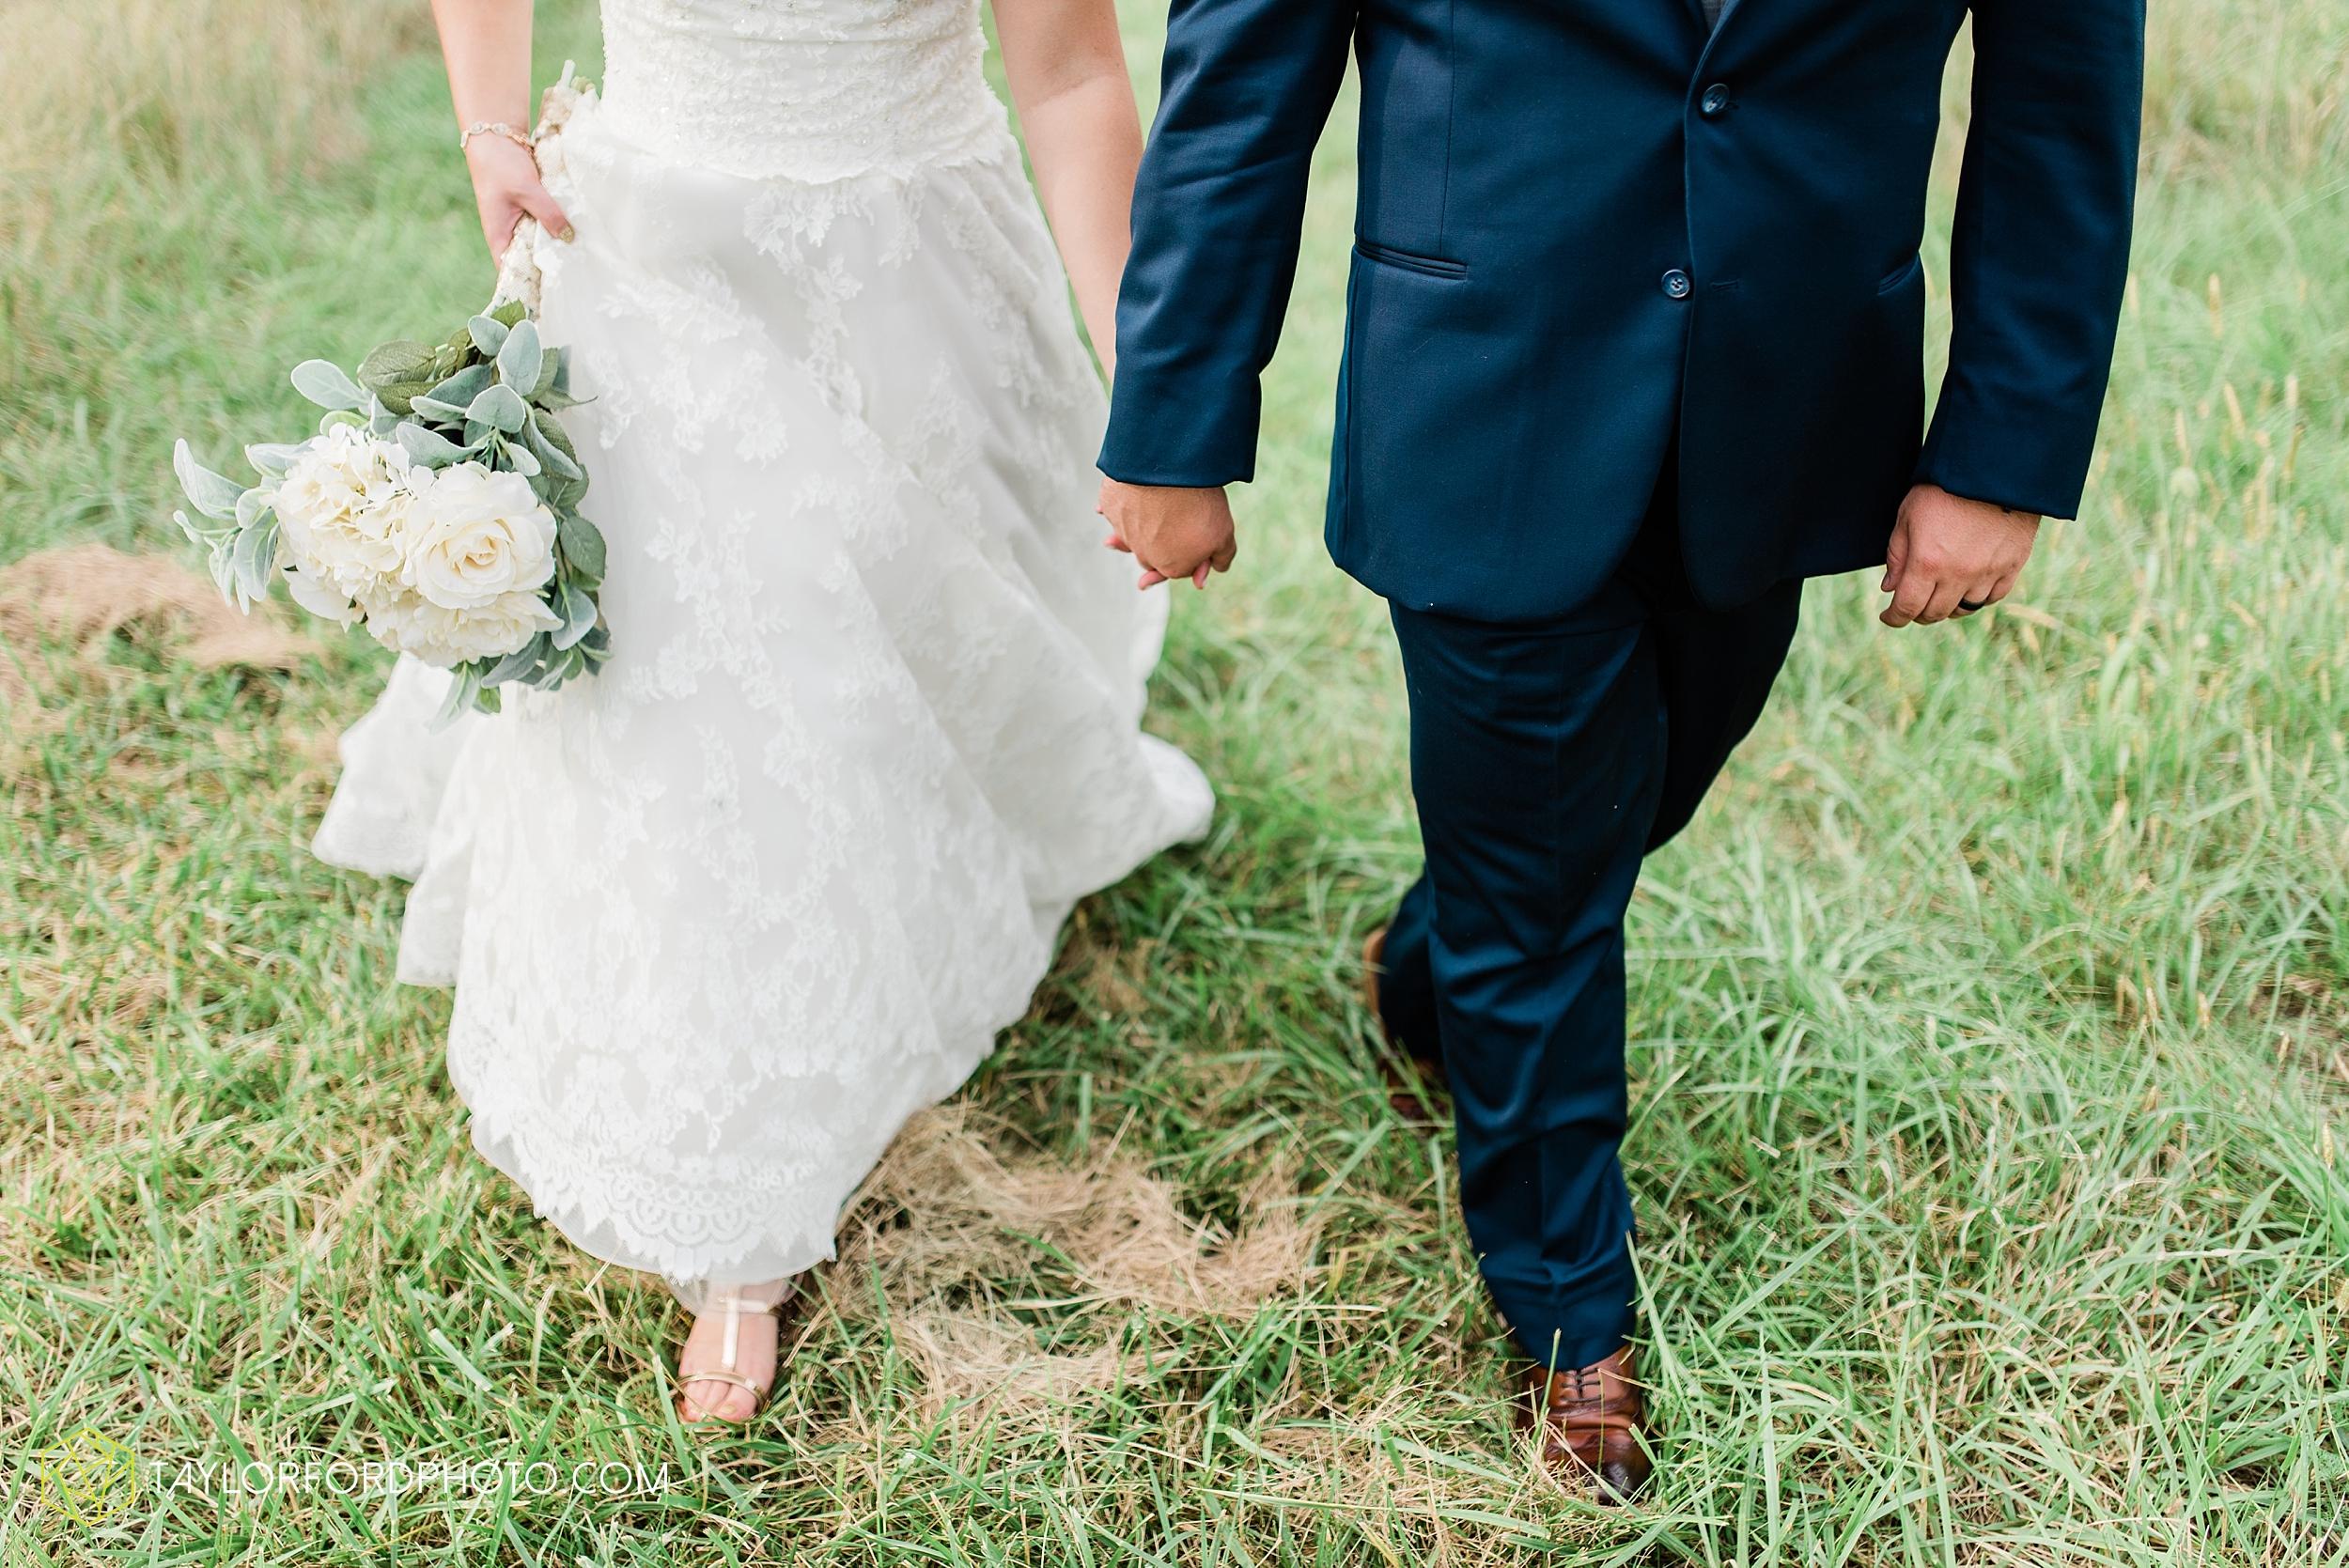 chelsey-zosh-jackson-young-first-united-methodist-church-senior-center-van-wert-ohio-wedding-photographer-taylor-ford-photography_0090.jpg